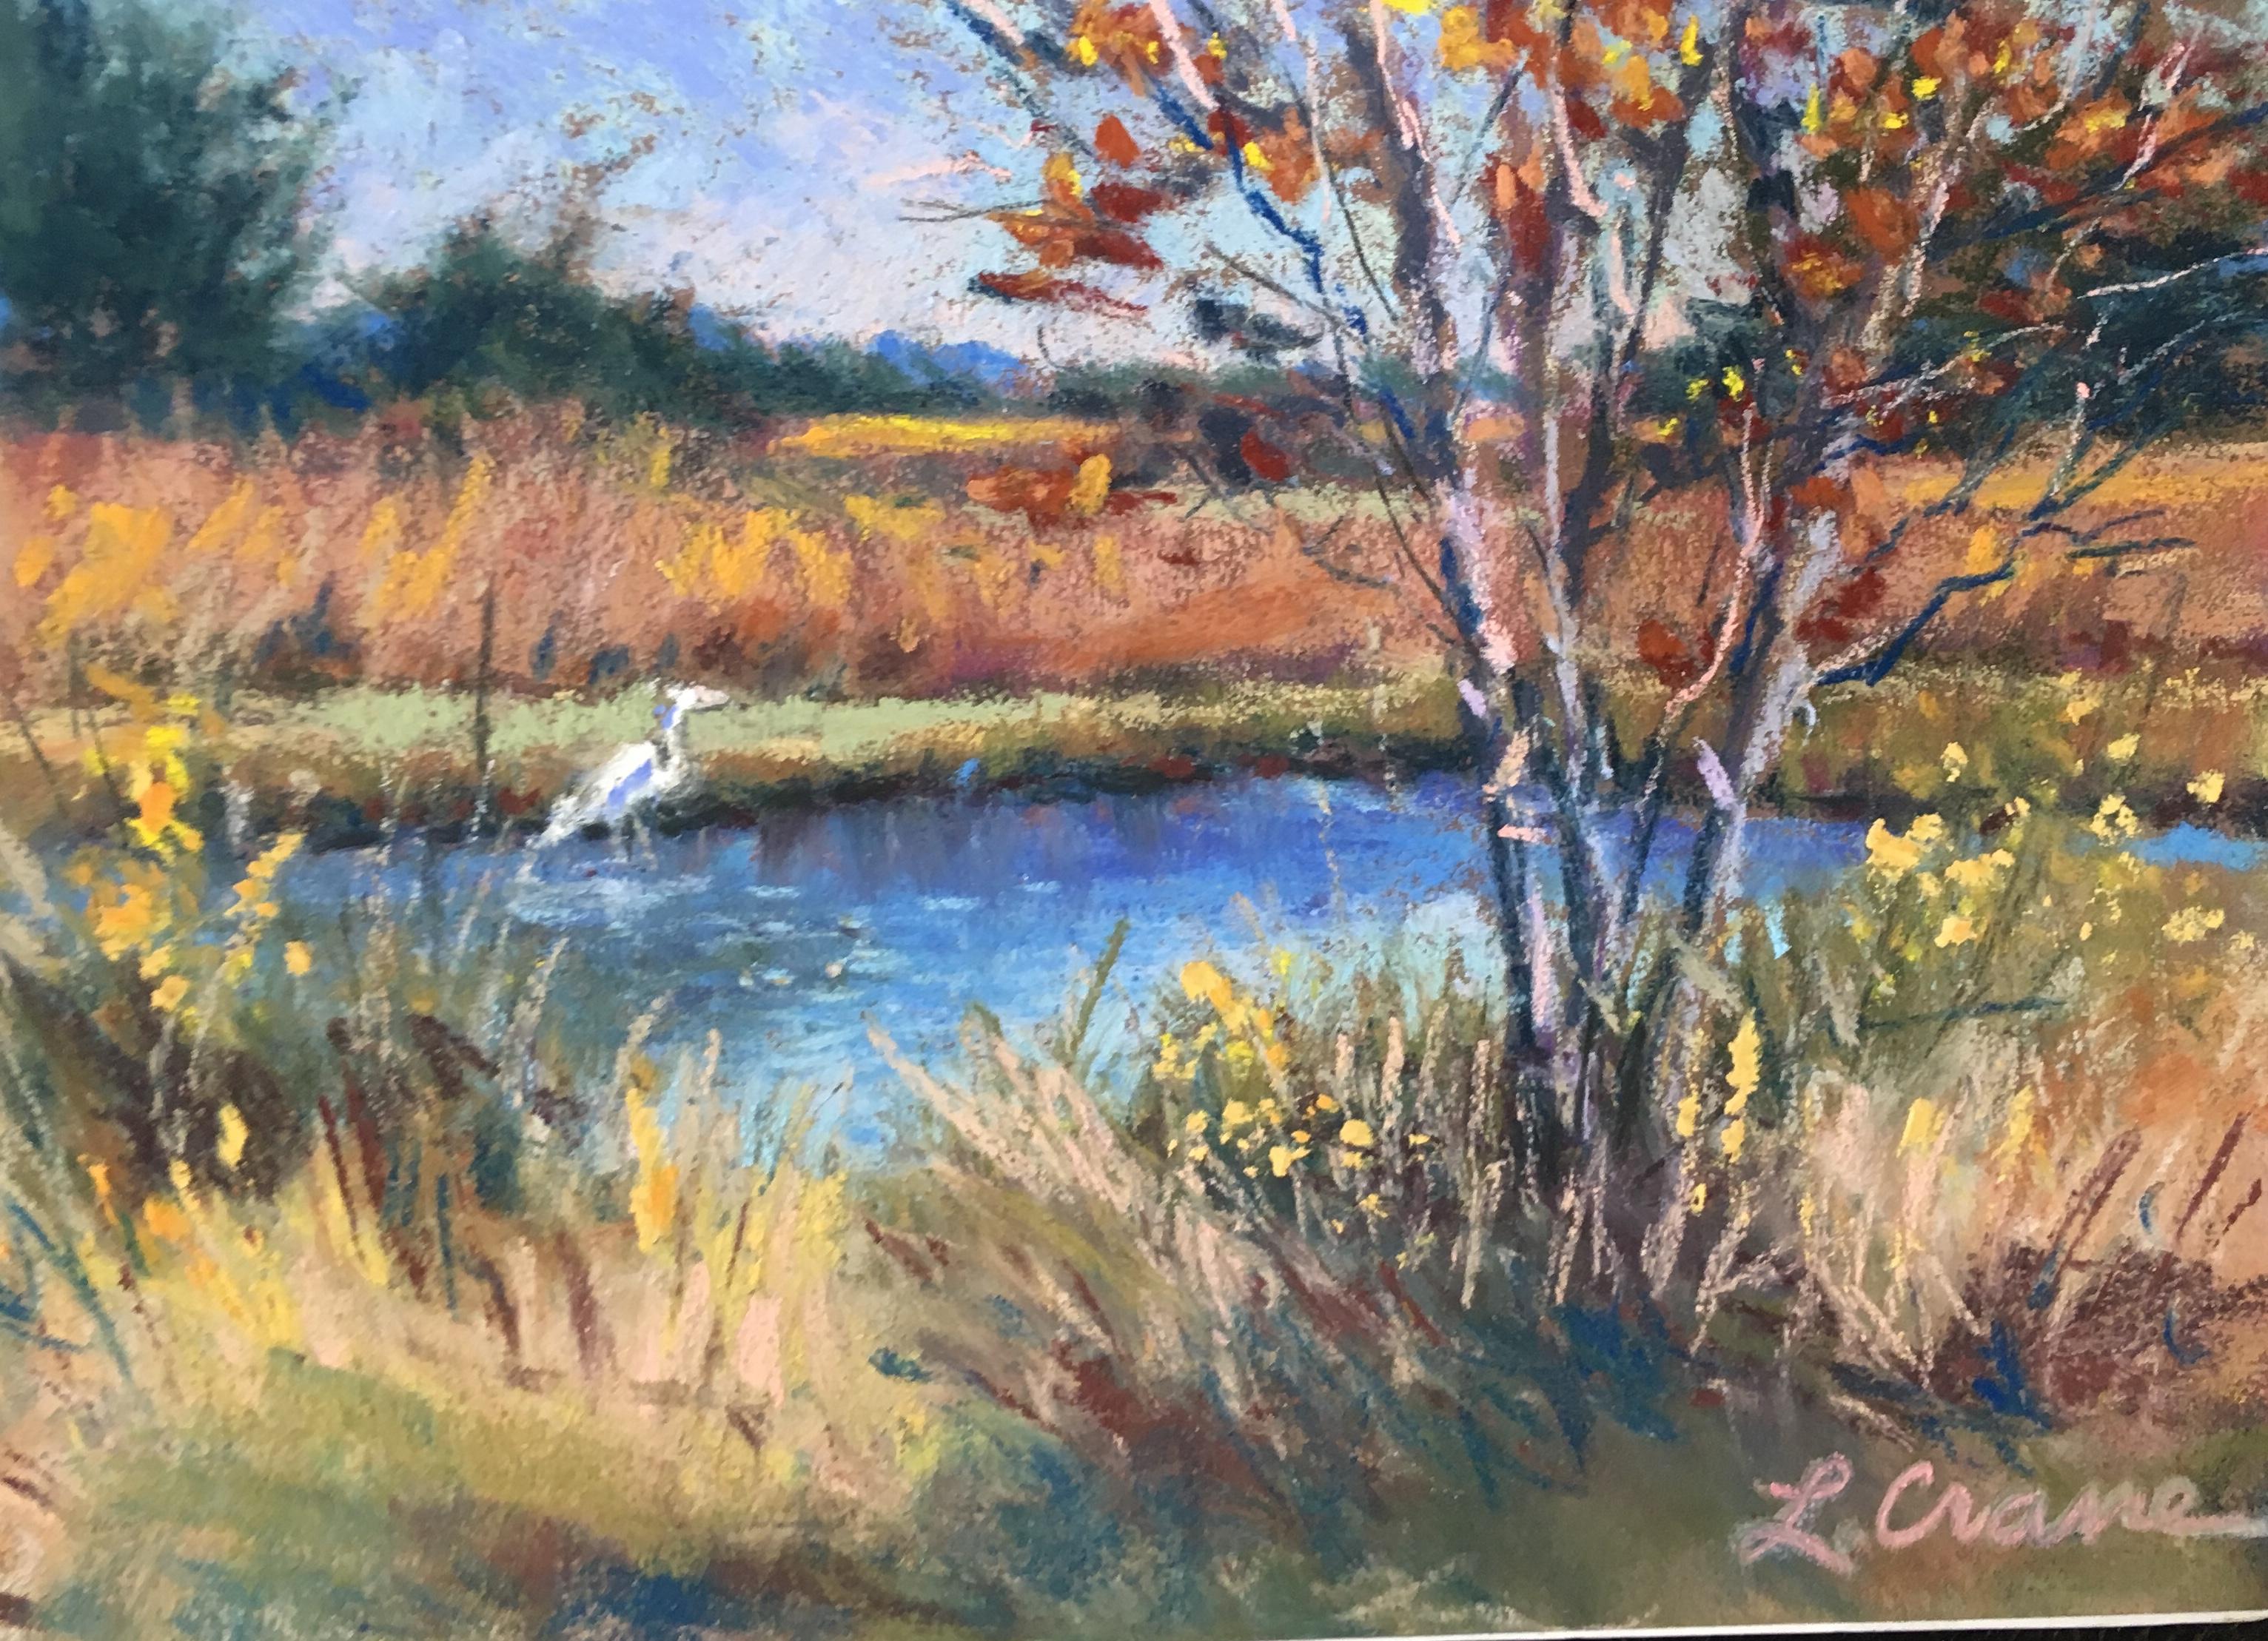 Pierces Point Pond